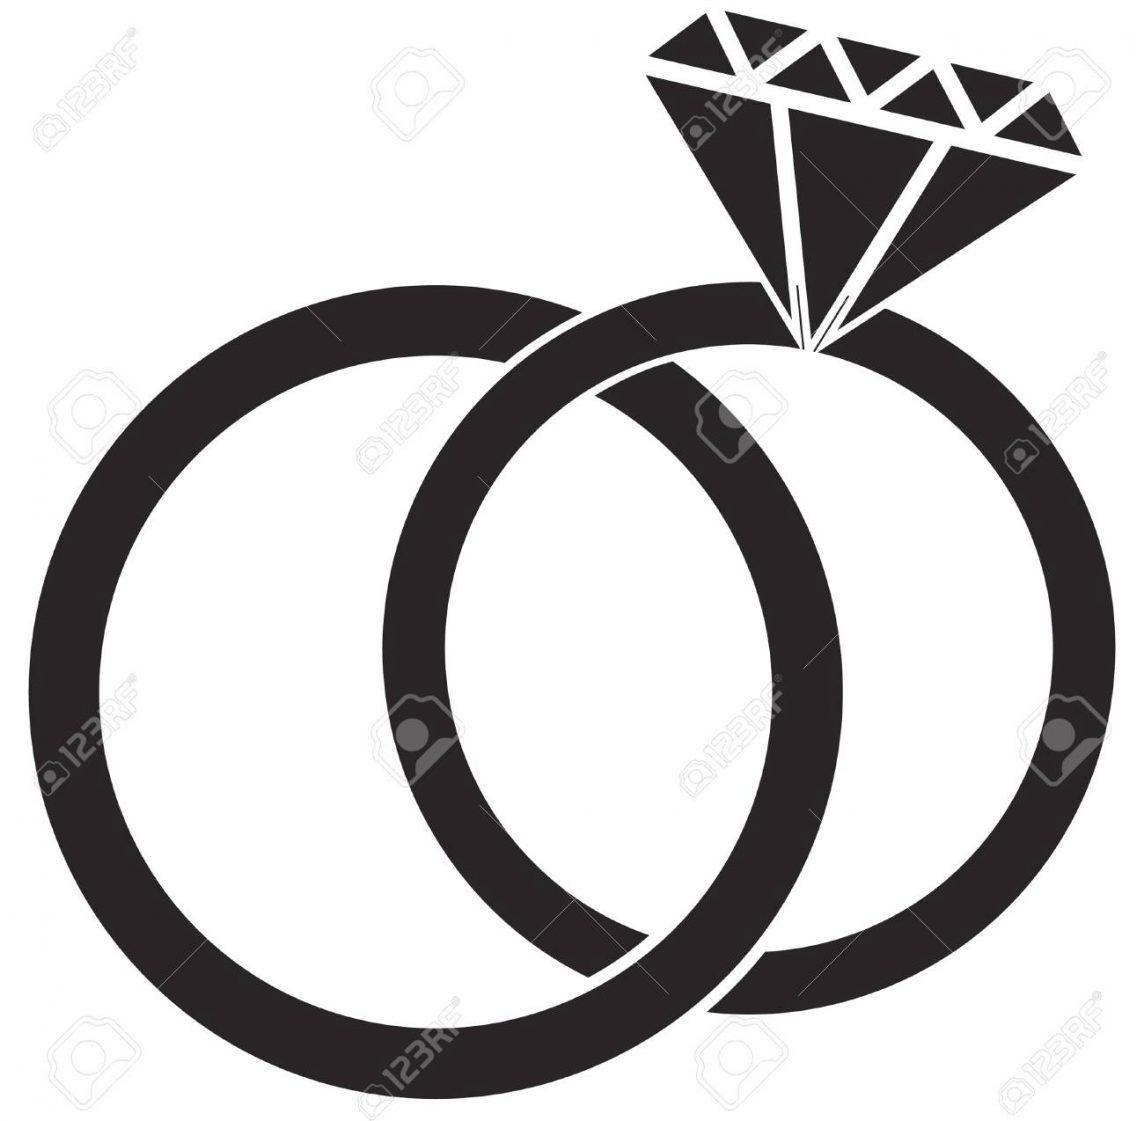 1144x1121 Famous Wedding Ring Silhouette Embellishment